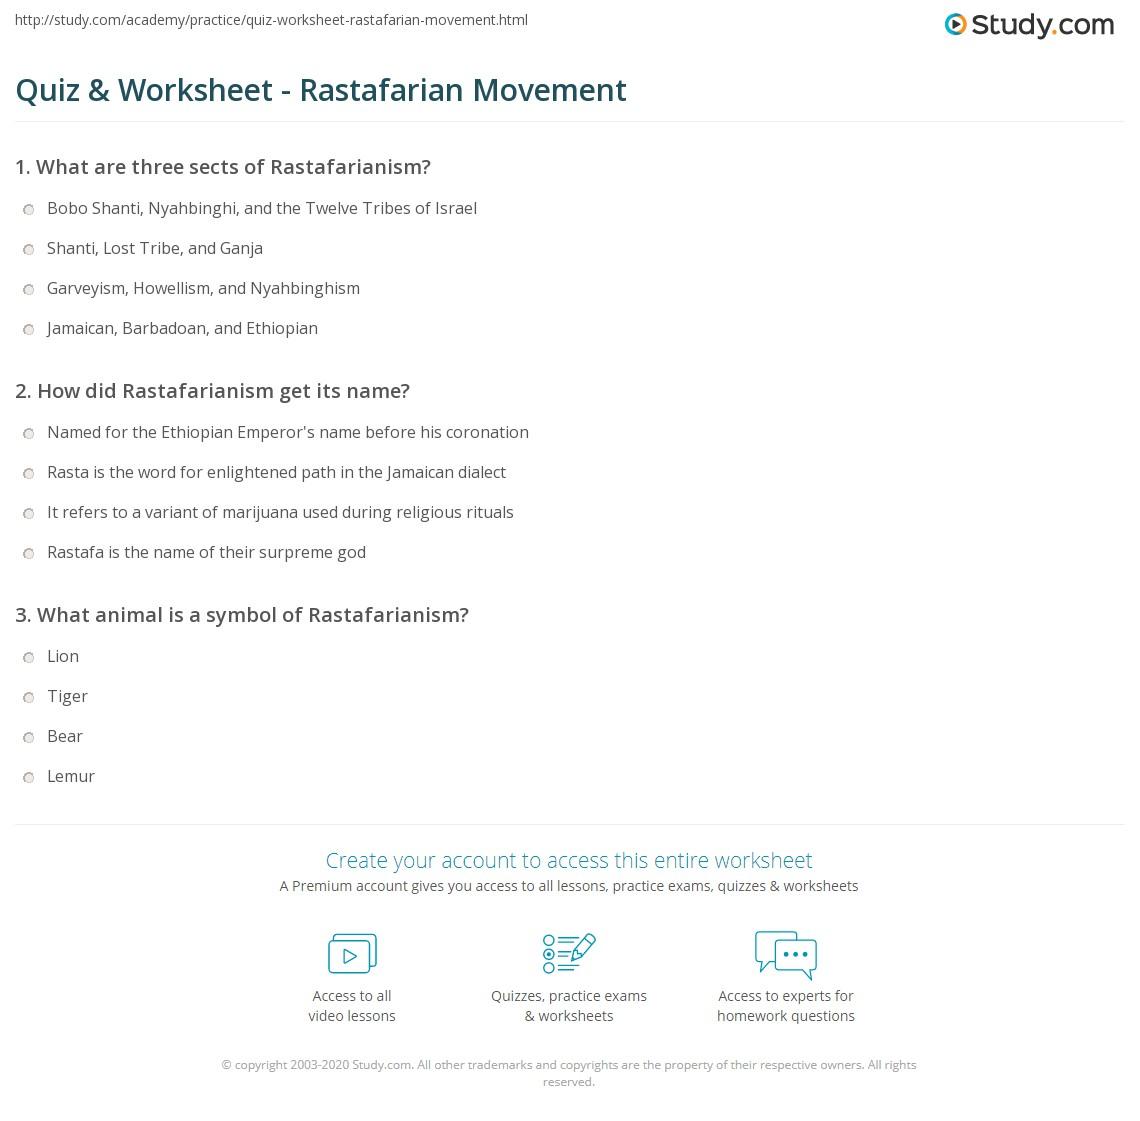 Quiz worksheet rastafarian movement study print rastafarianism movement symbols worksheet biocorpaavc Image collections